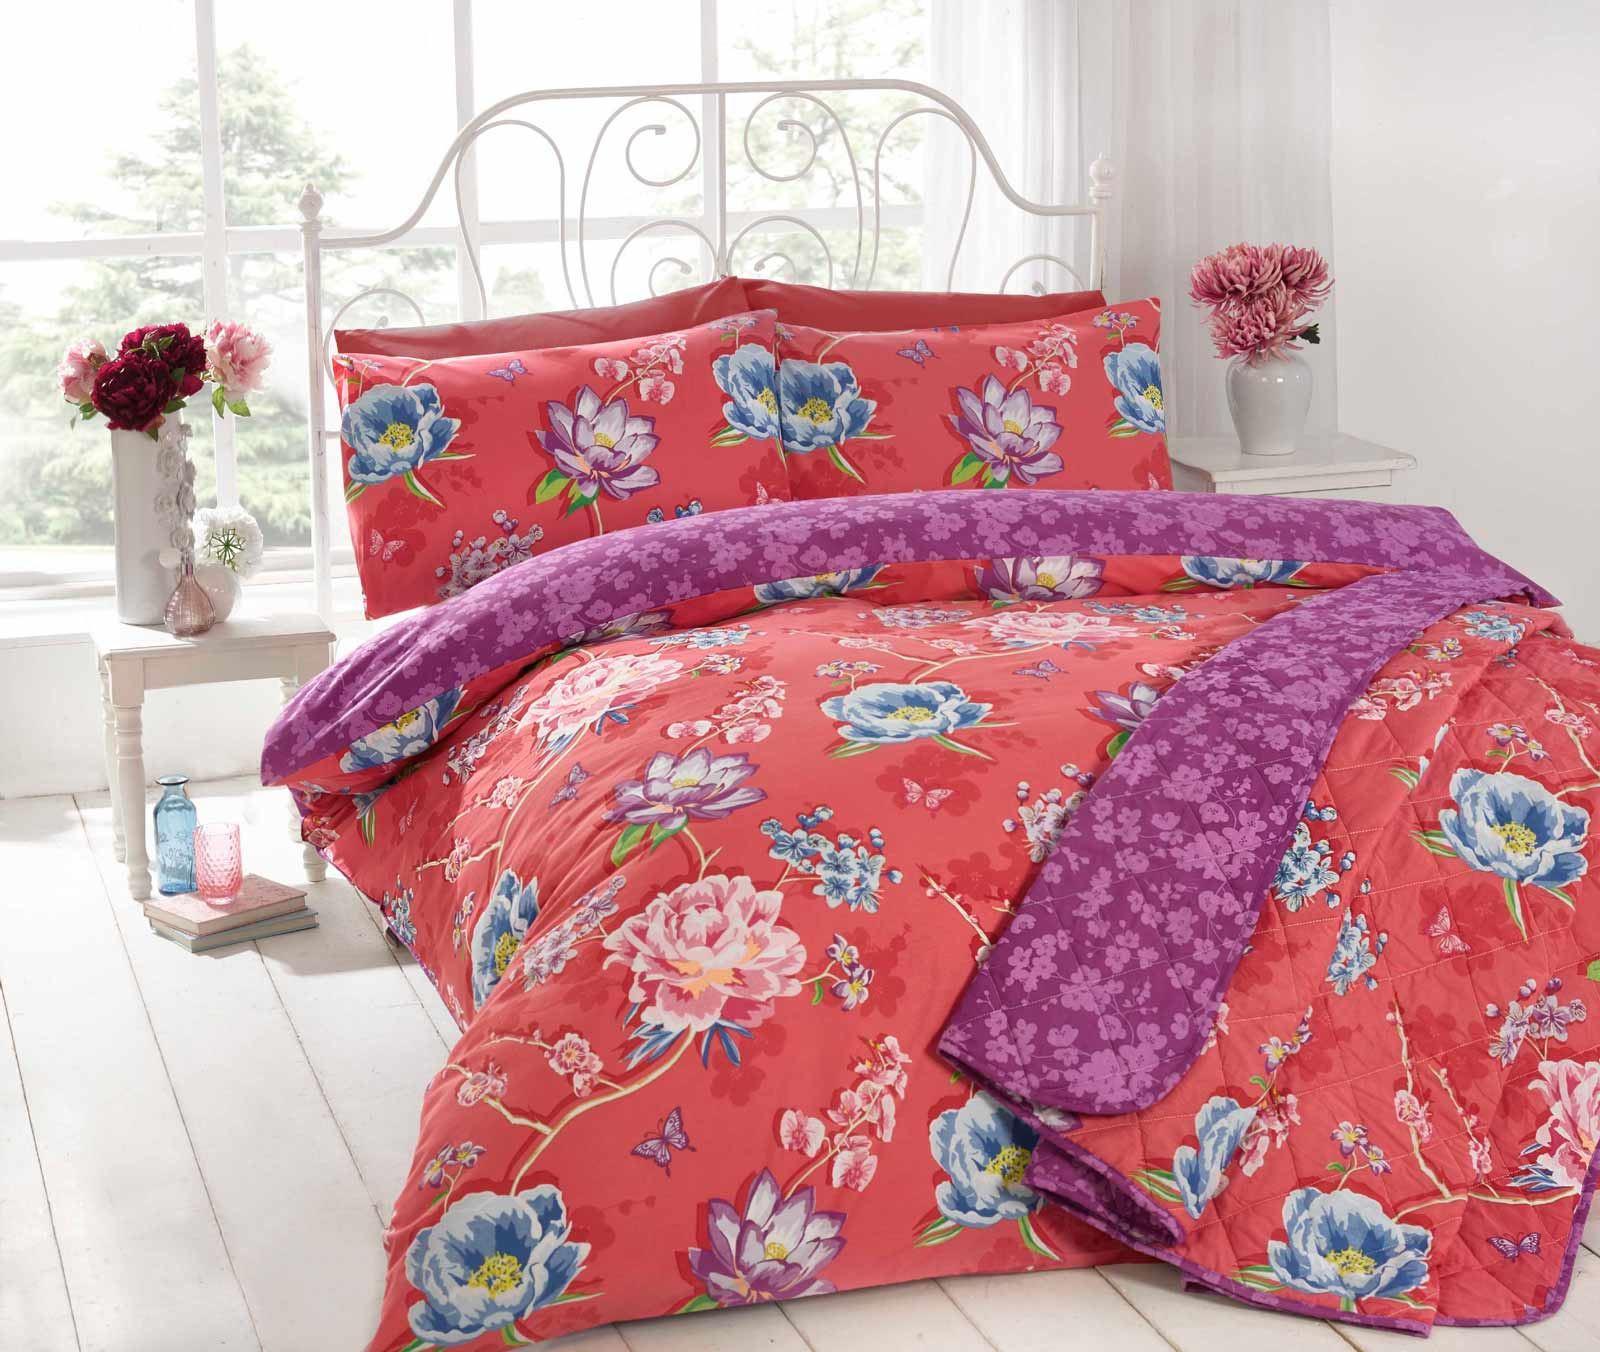 sapporo modern floral duvet quilt doona cover poly cotton japanese  - sapporomodernfloralduvetquiltdoonacoverpoly